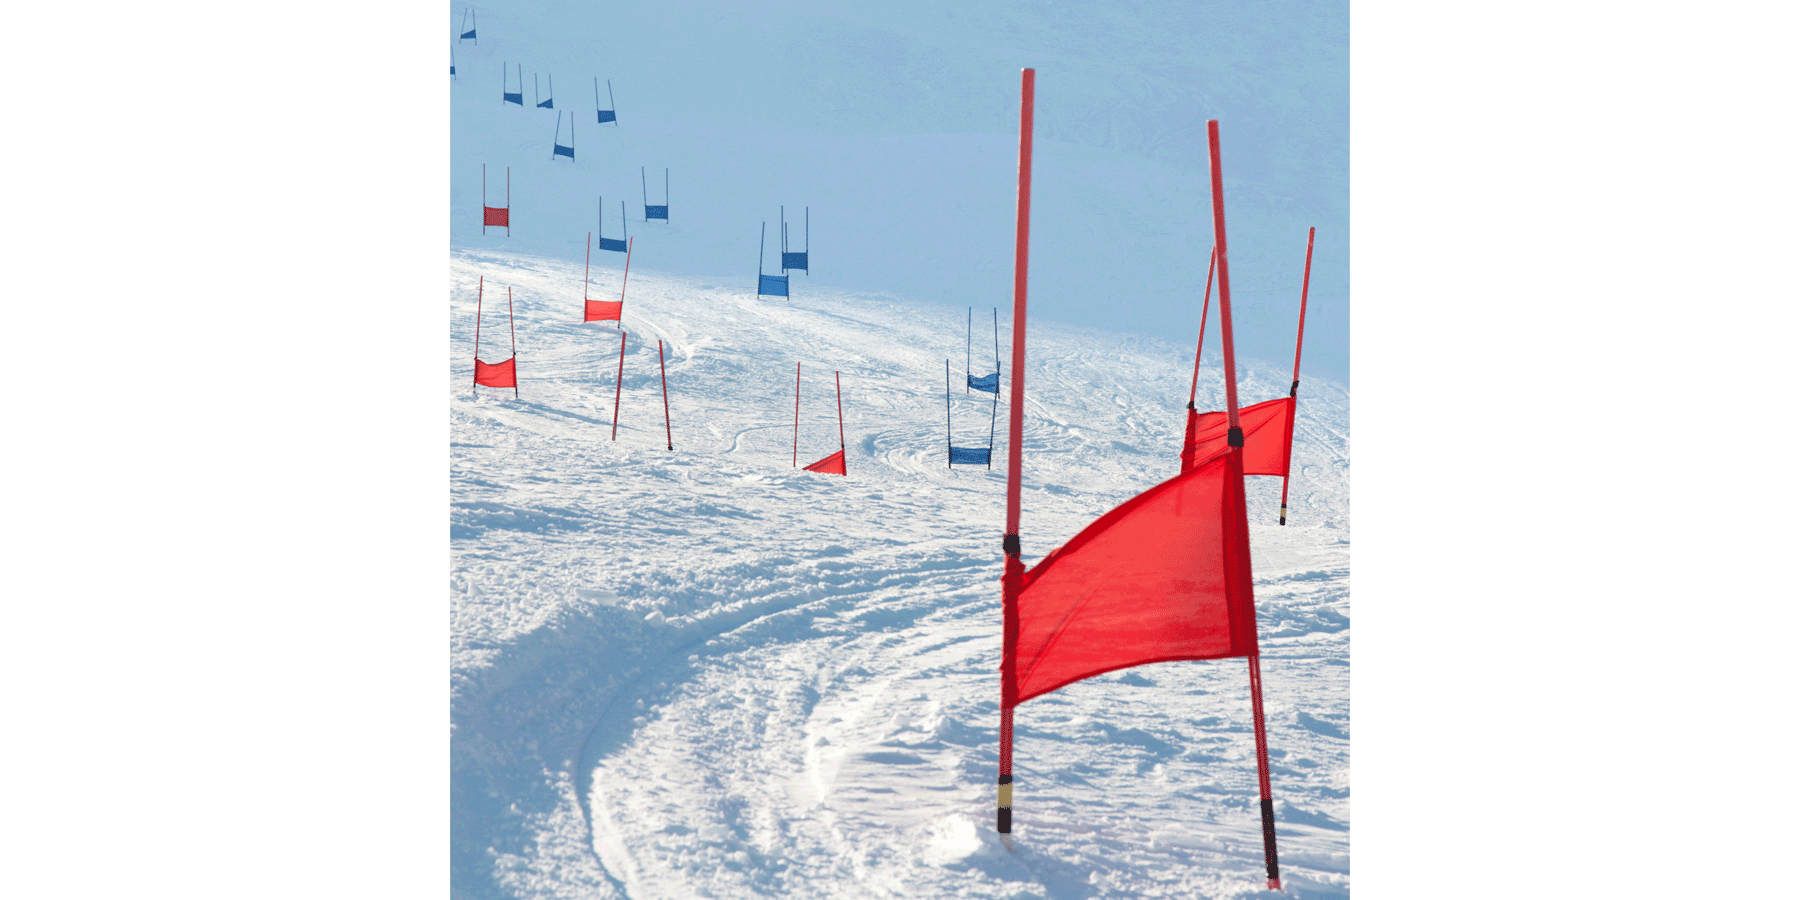 ski-races